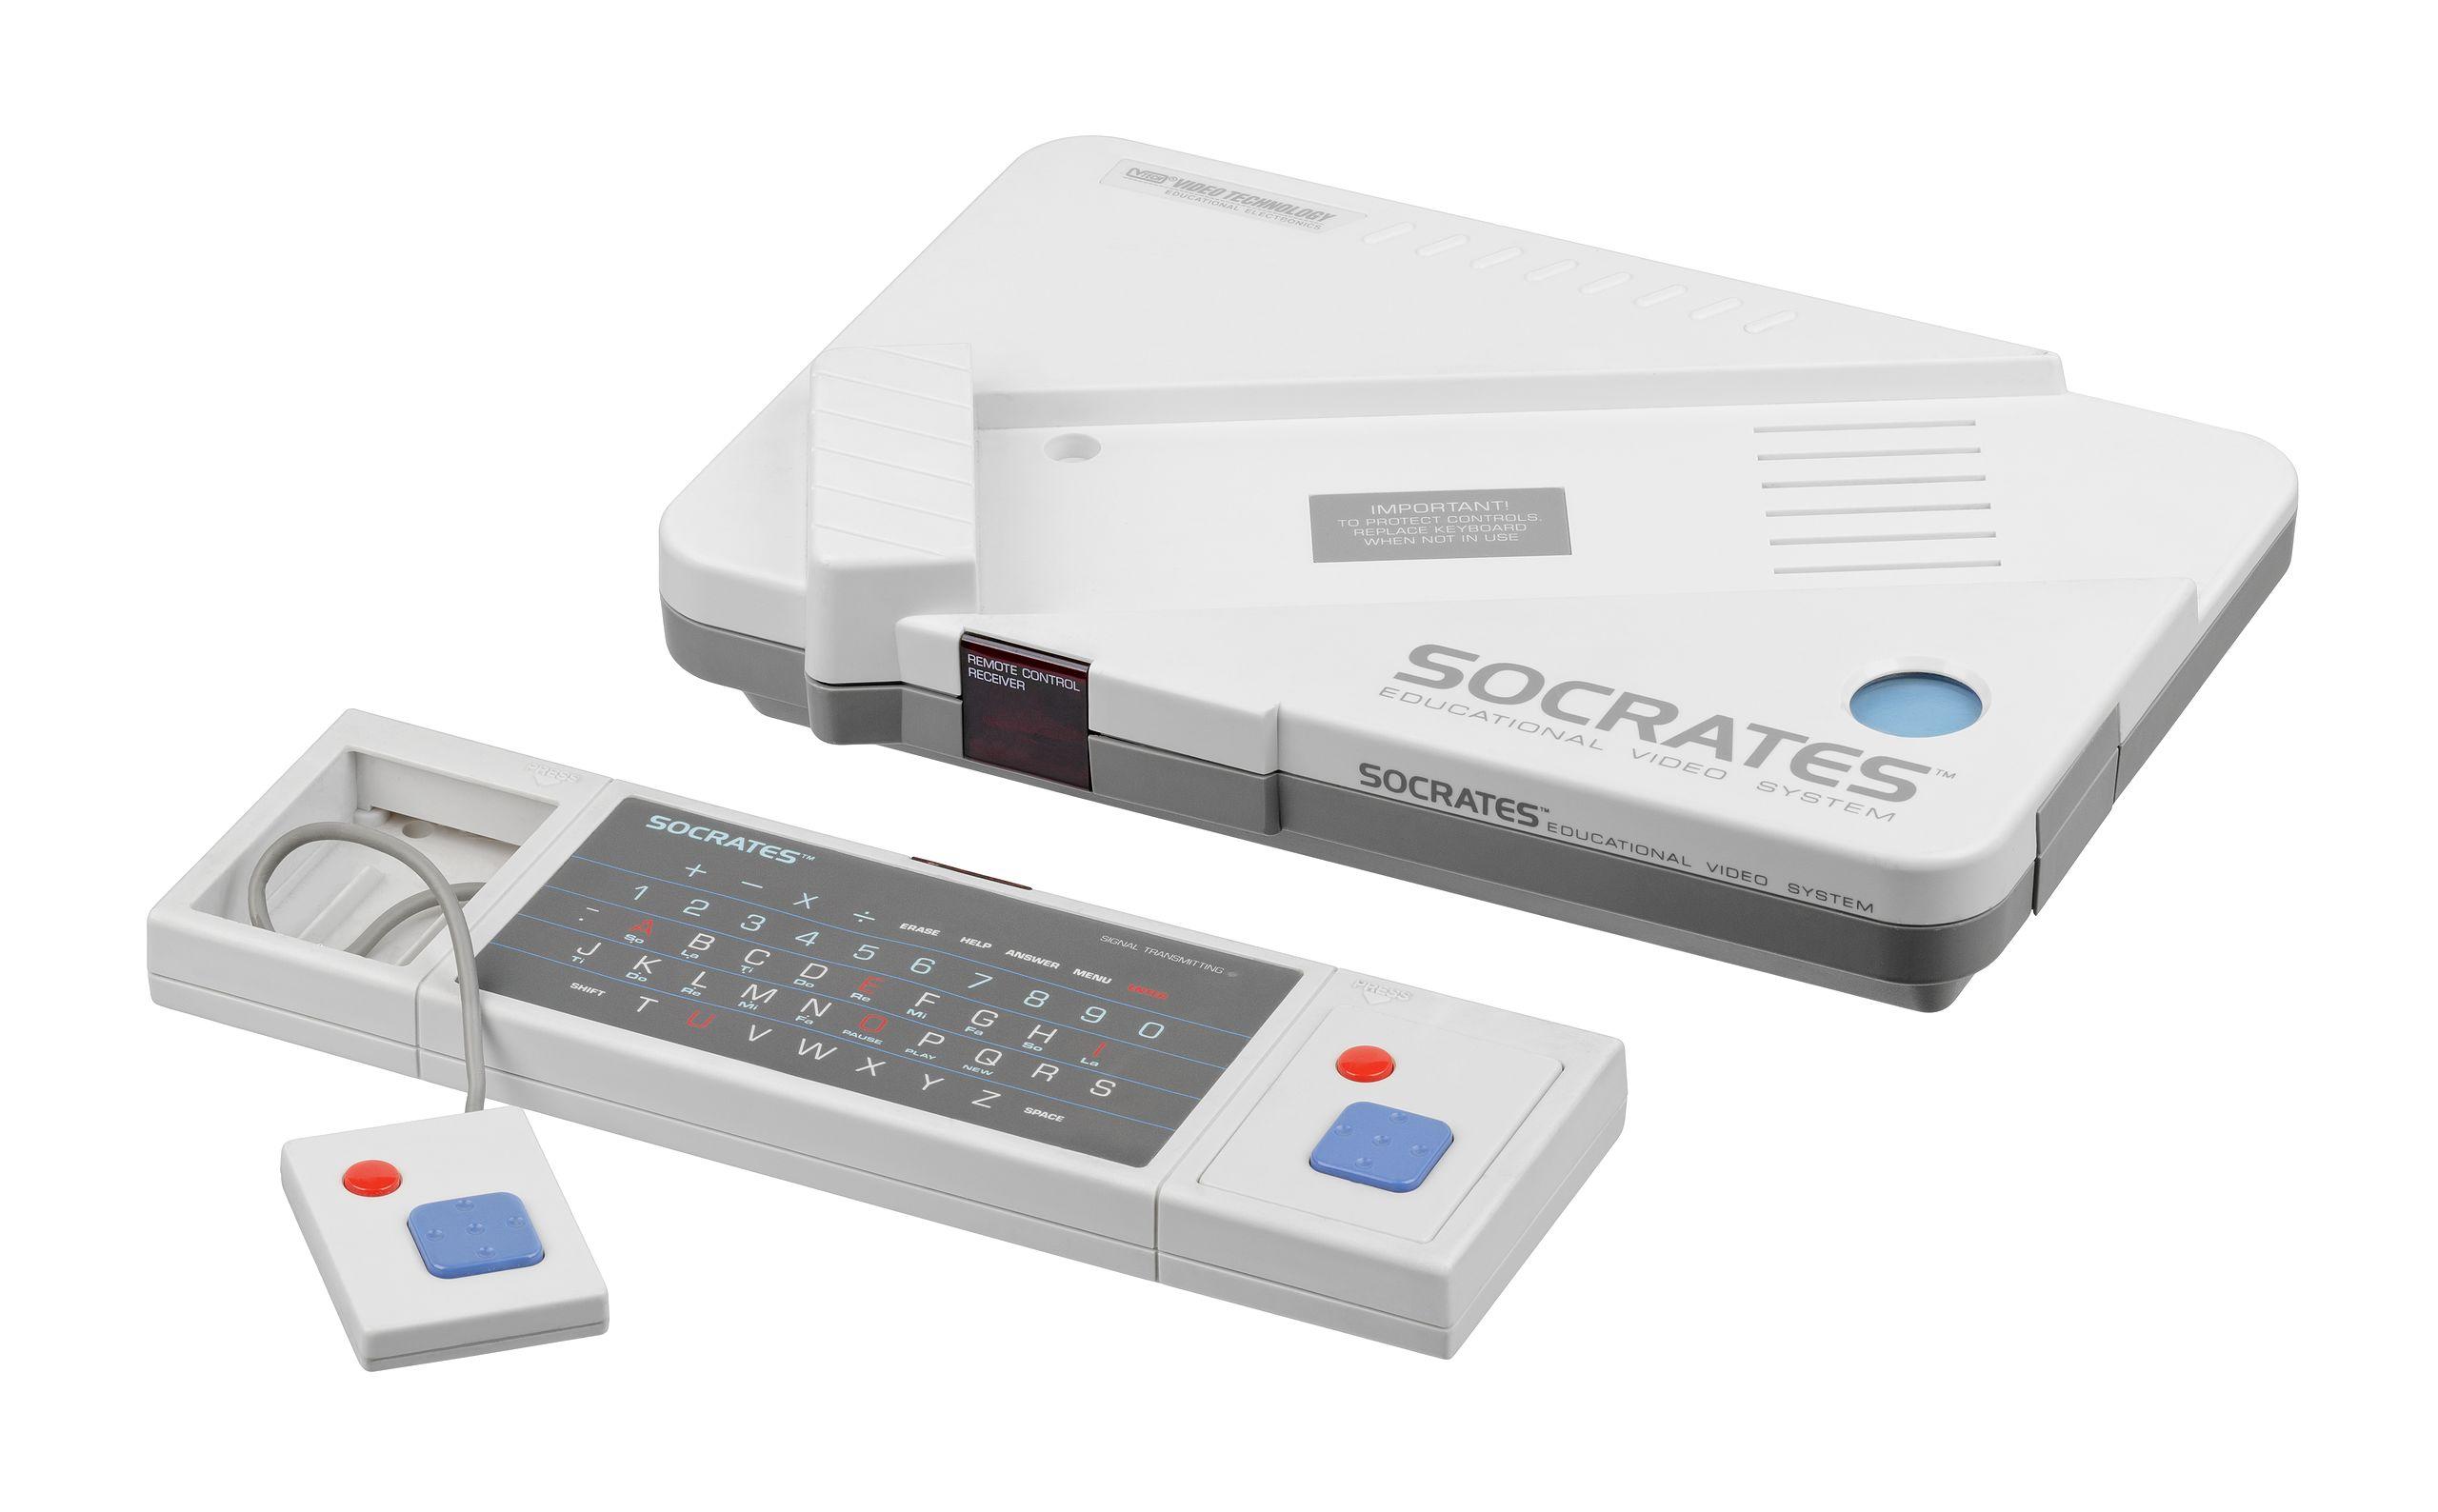 VTech-Socrates-Set-FL.jpg